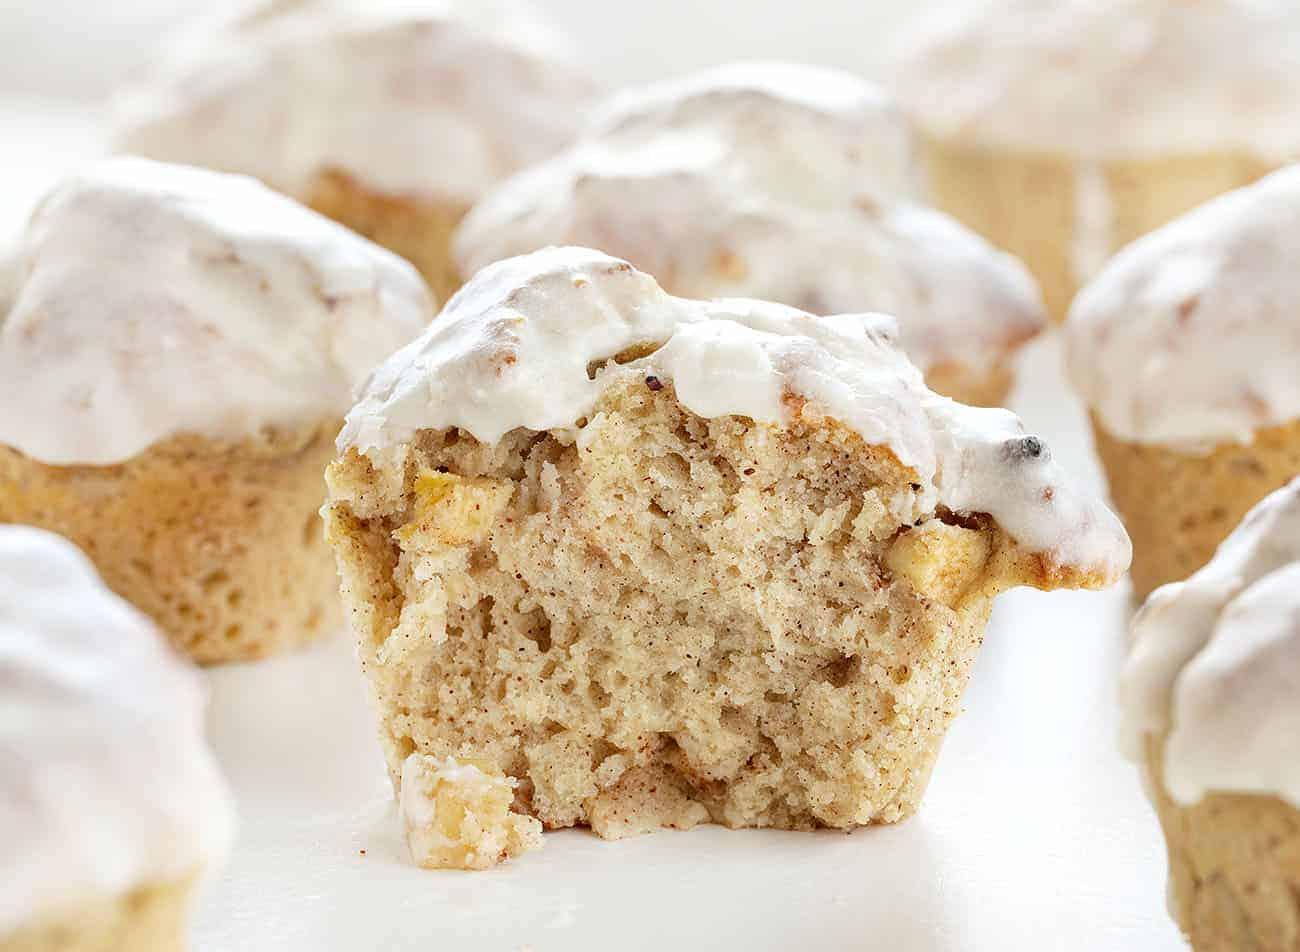 Bit into Apple Muffin